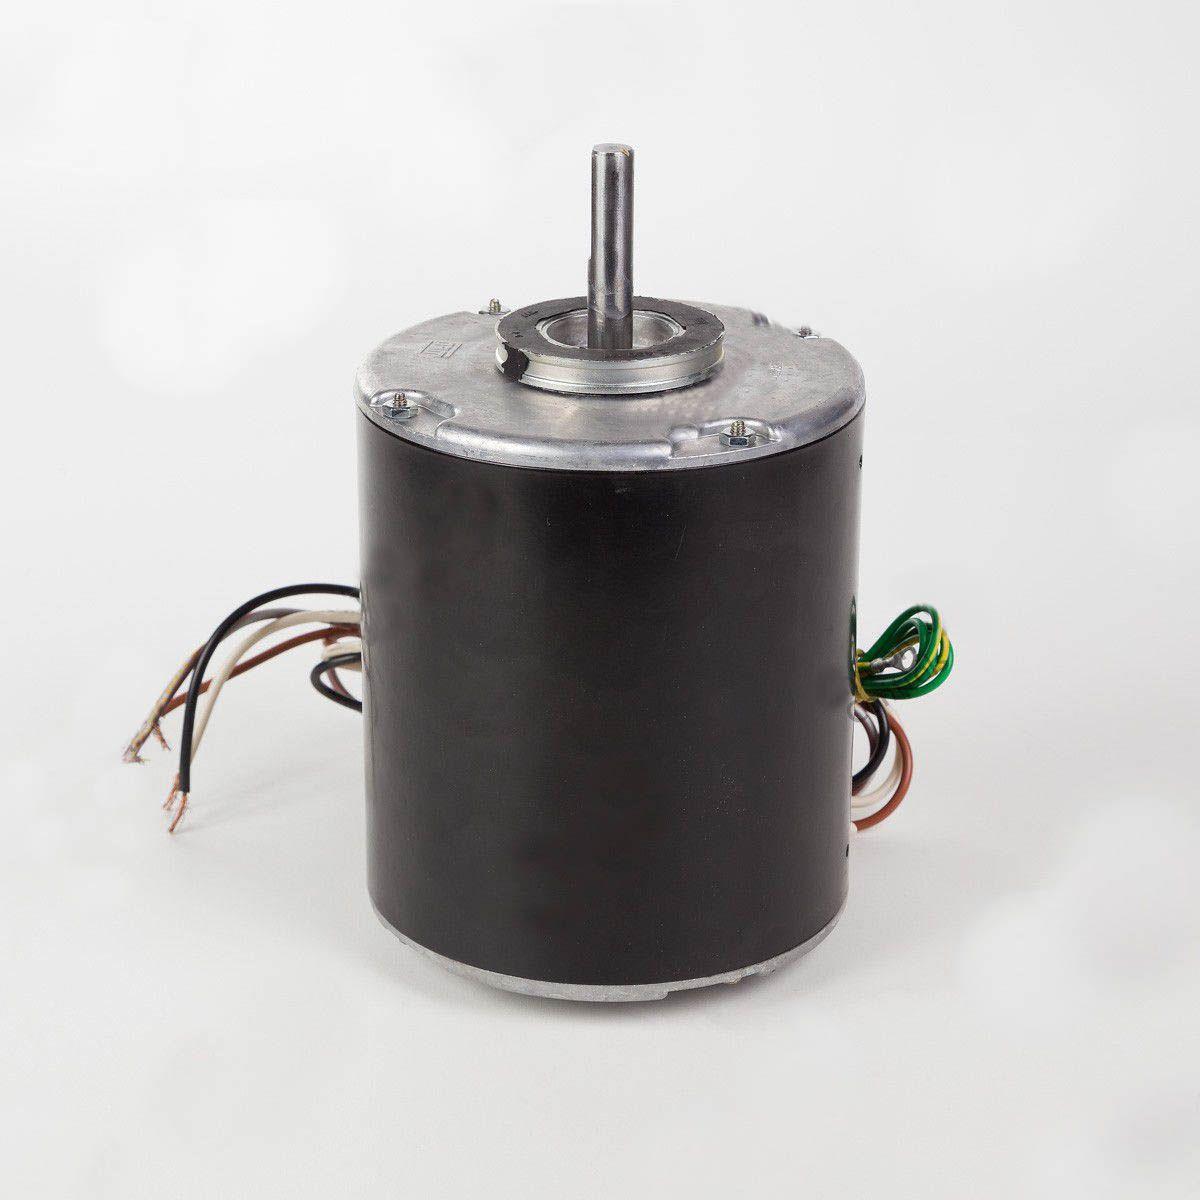 Motor Ventilador 1/4cv 8P 220V Hitachi HLD9983A